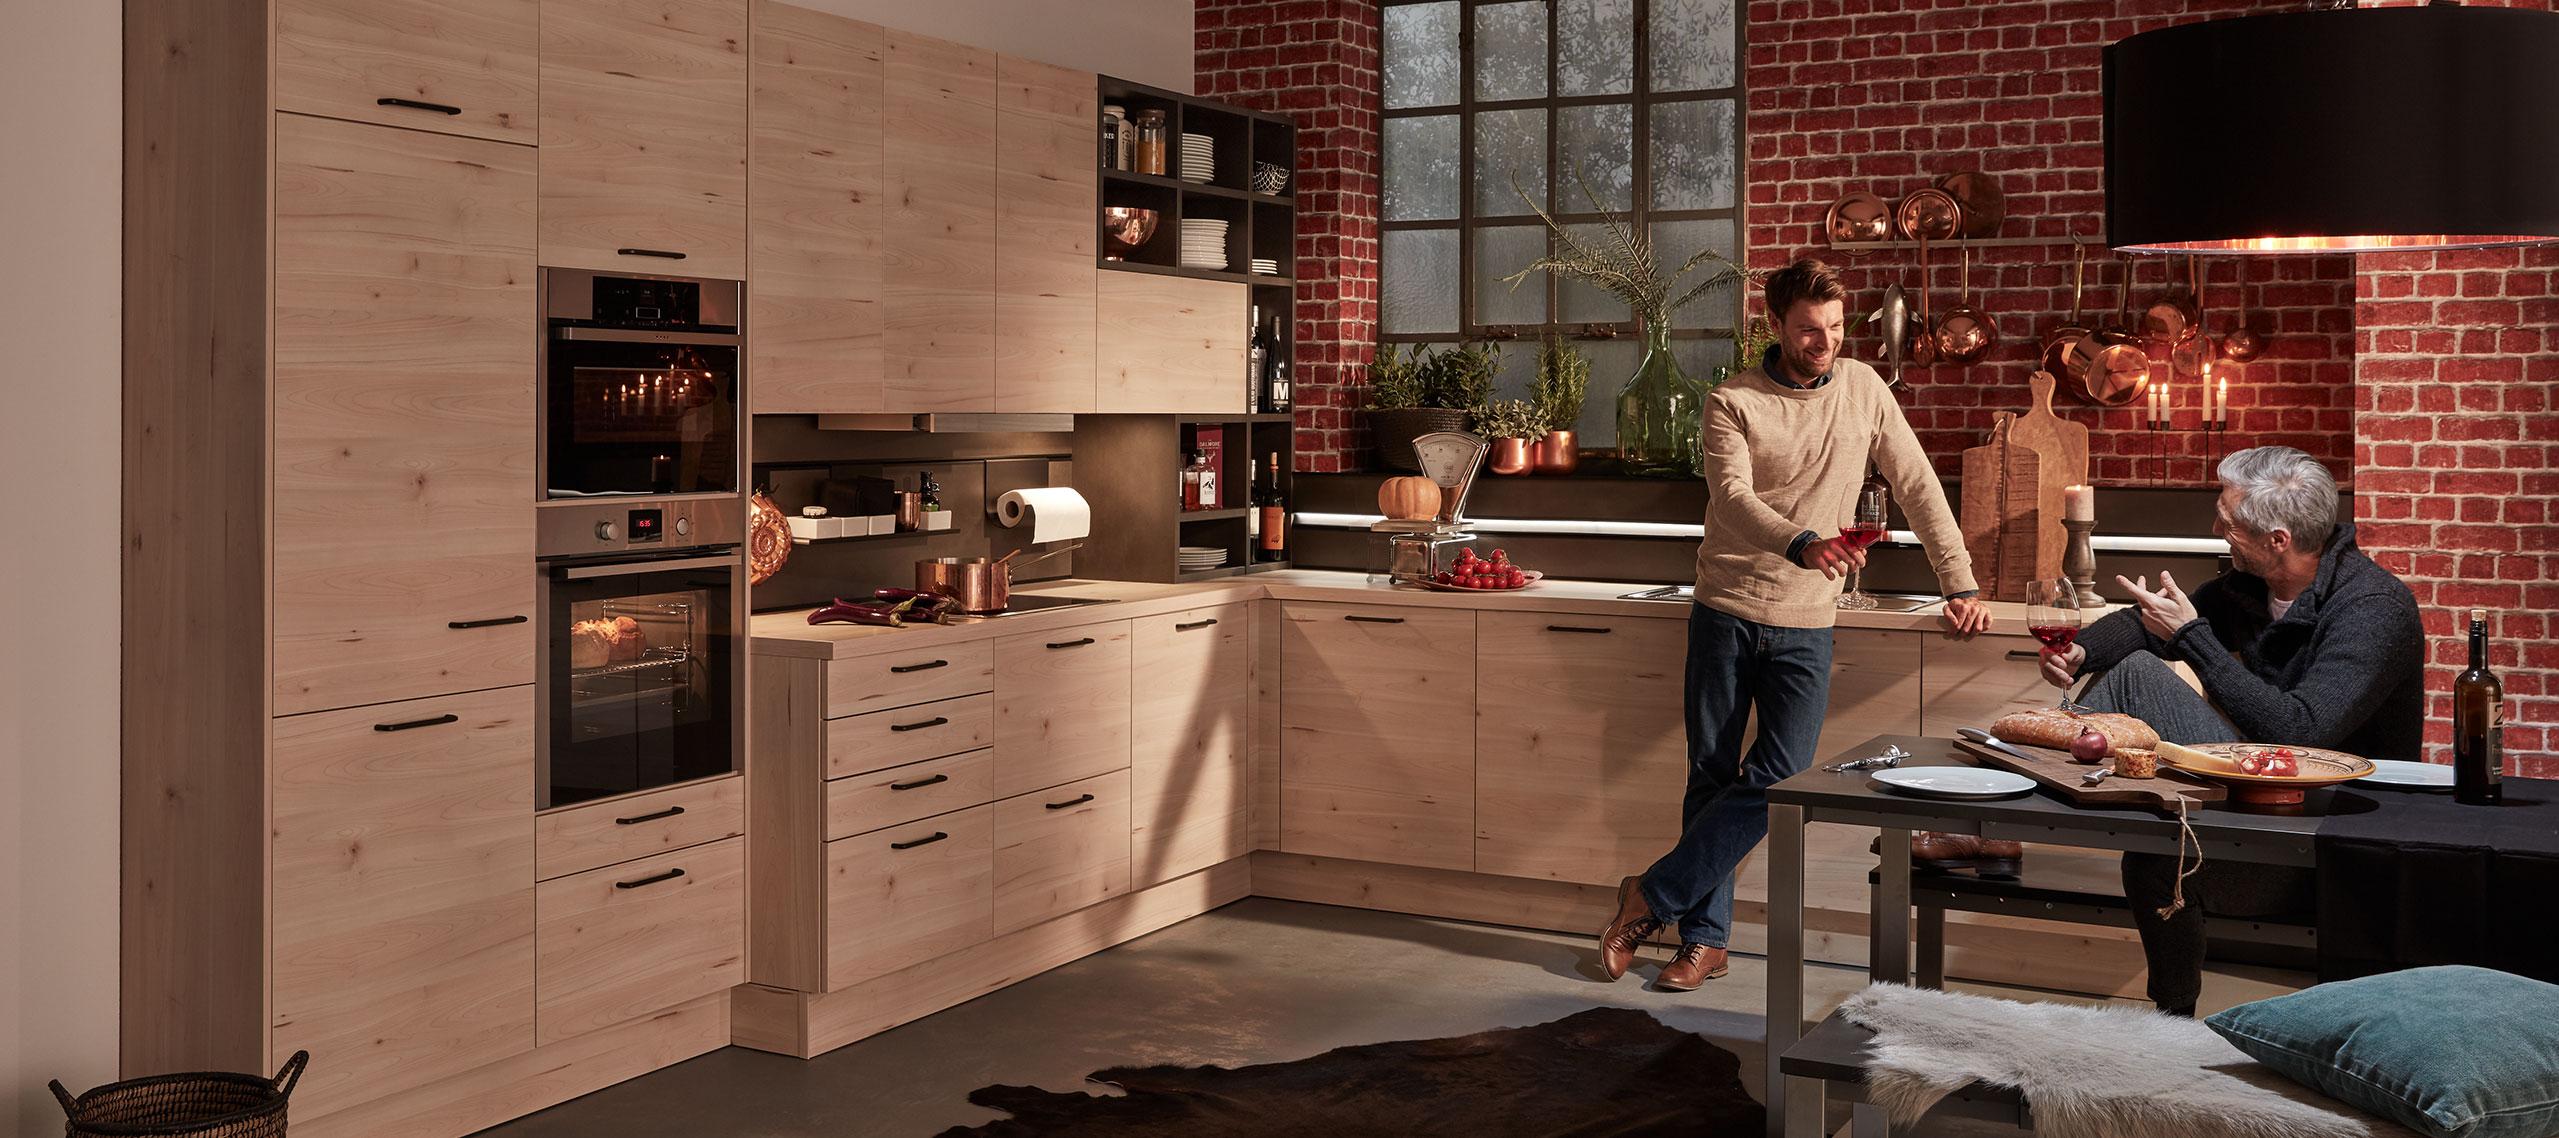 interline k chen die qualitativ hochwertige k che mit stil. Black Bedroom Furniture Sets. Home Design Ideas